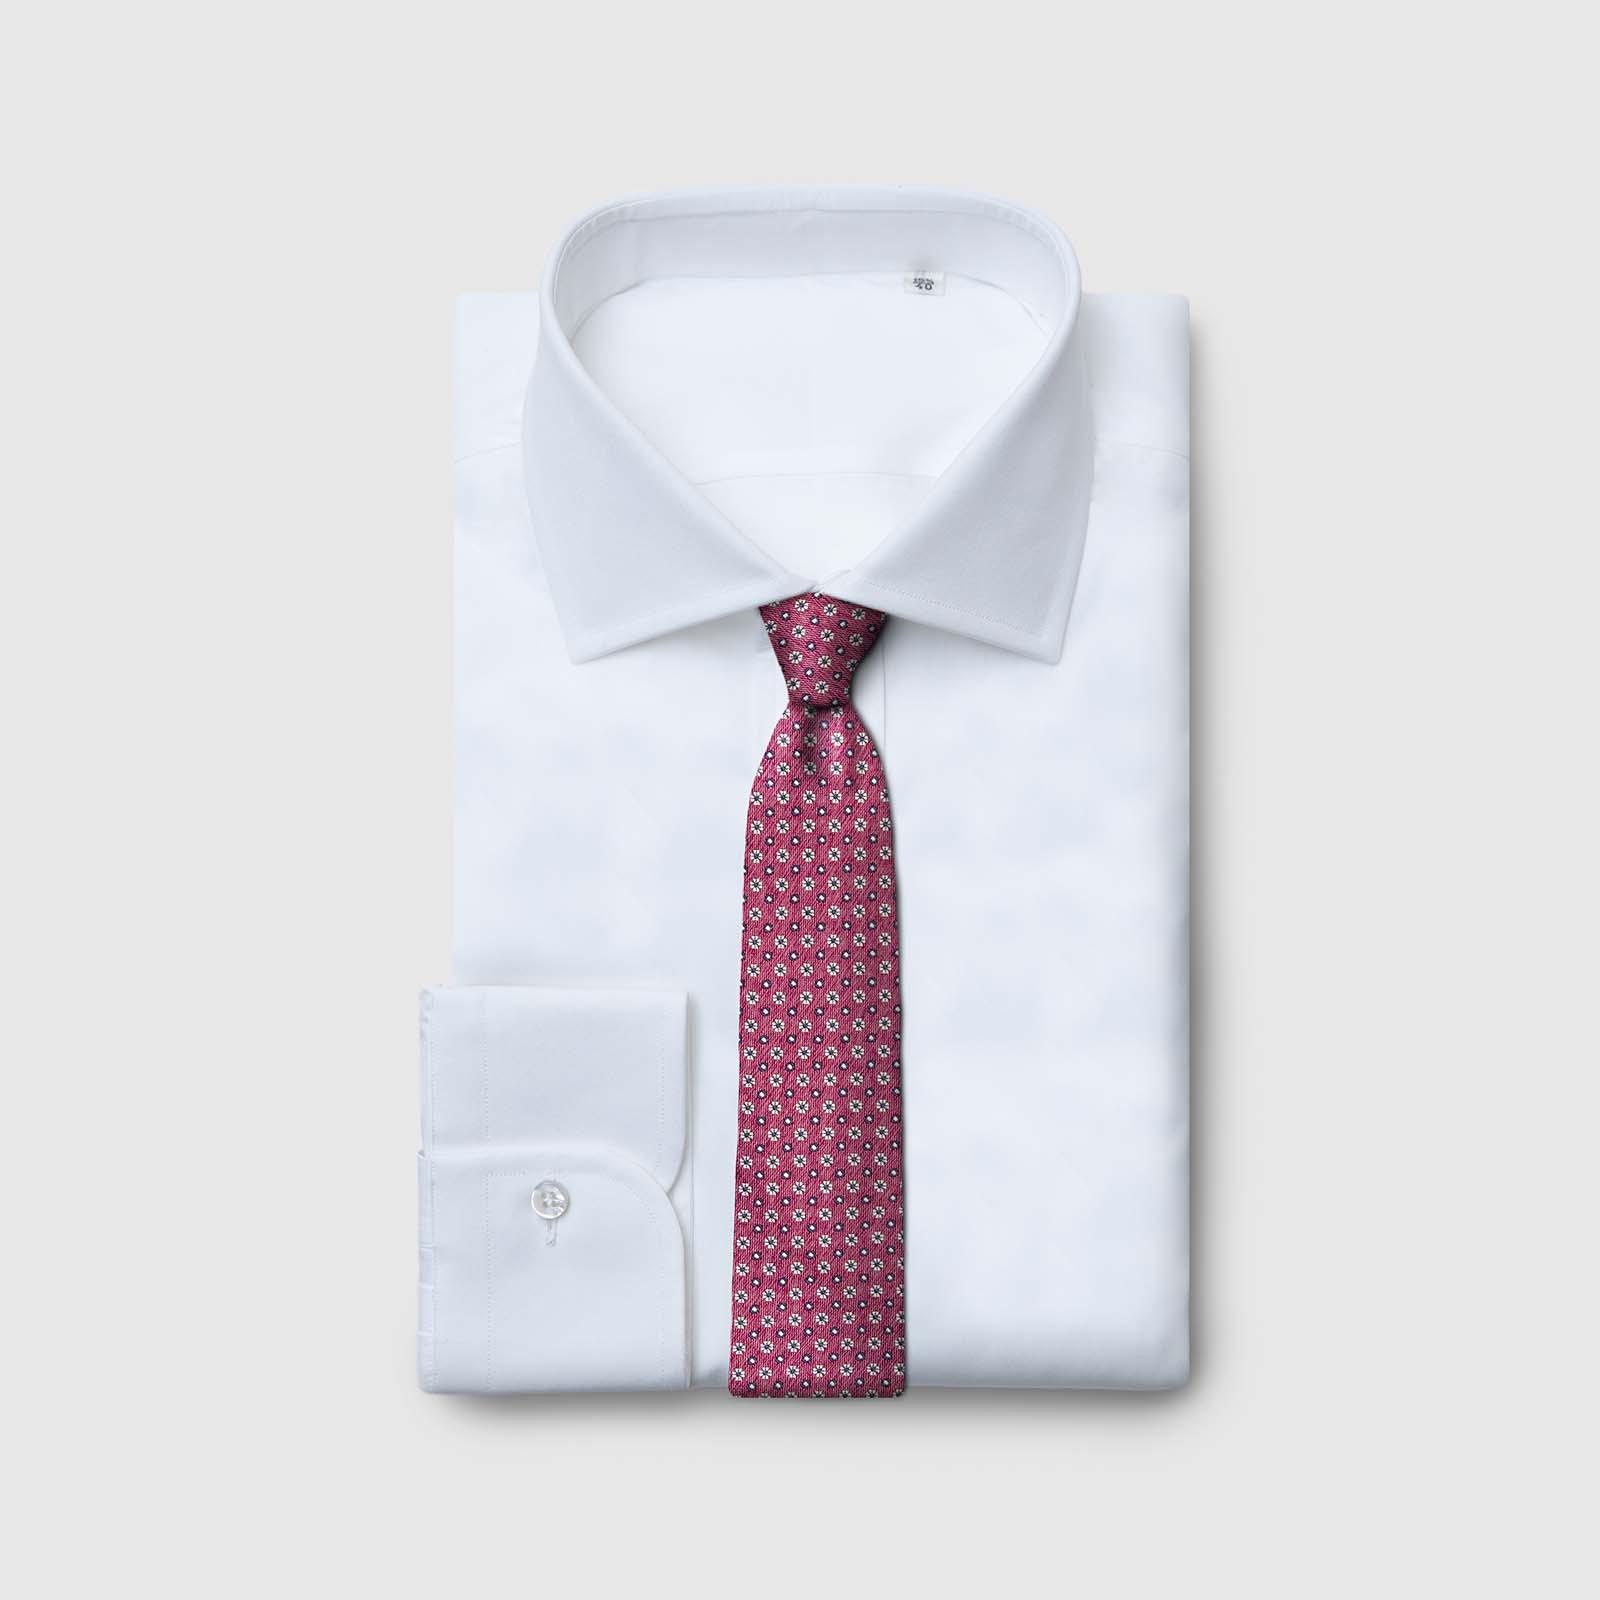 5-fold burgundy color tie